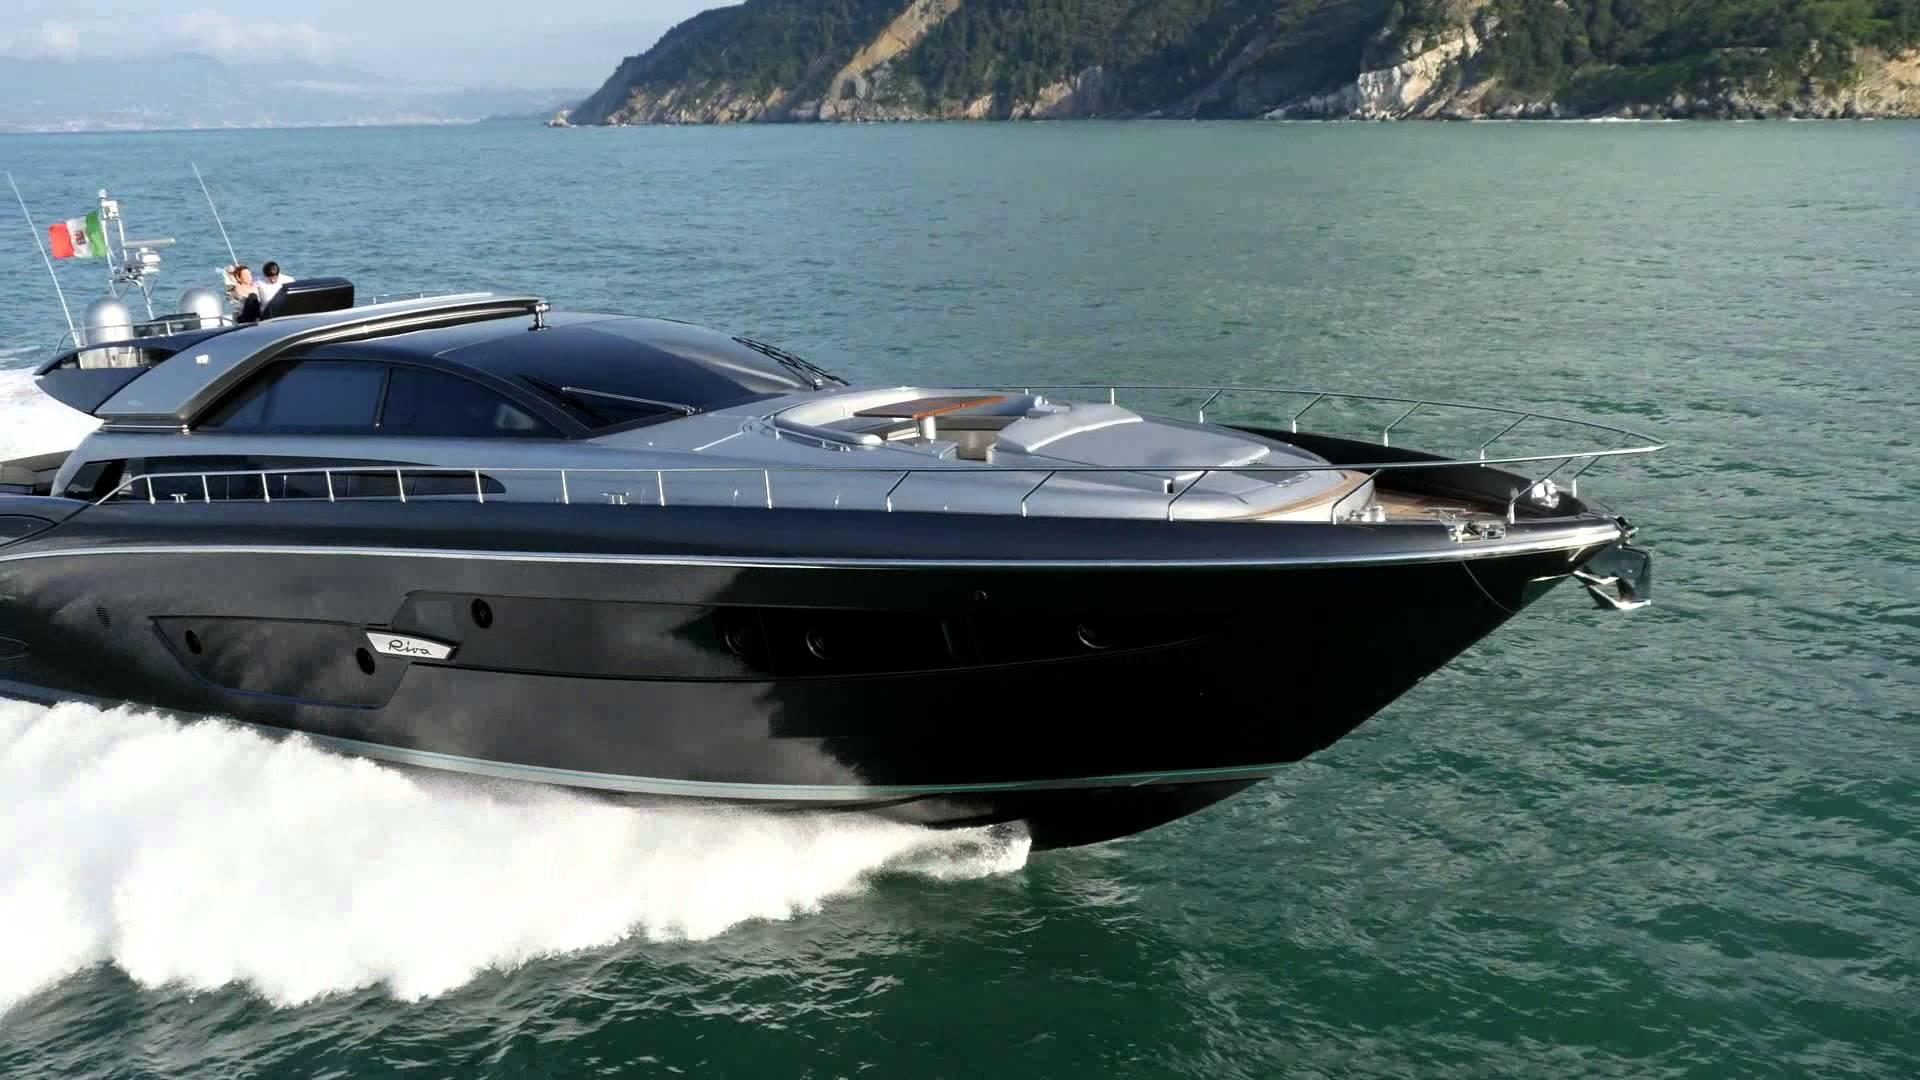 Riva 88´ Domino Super debutó en el Dubai International Boat Show